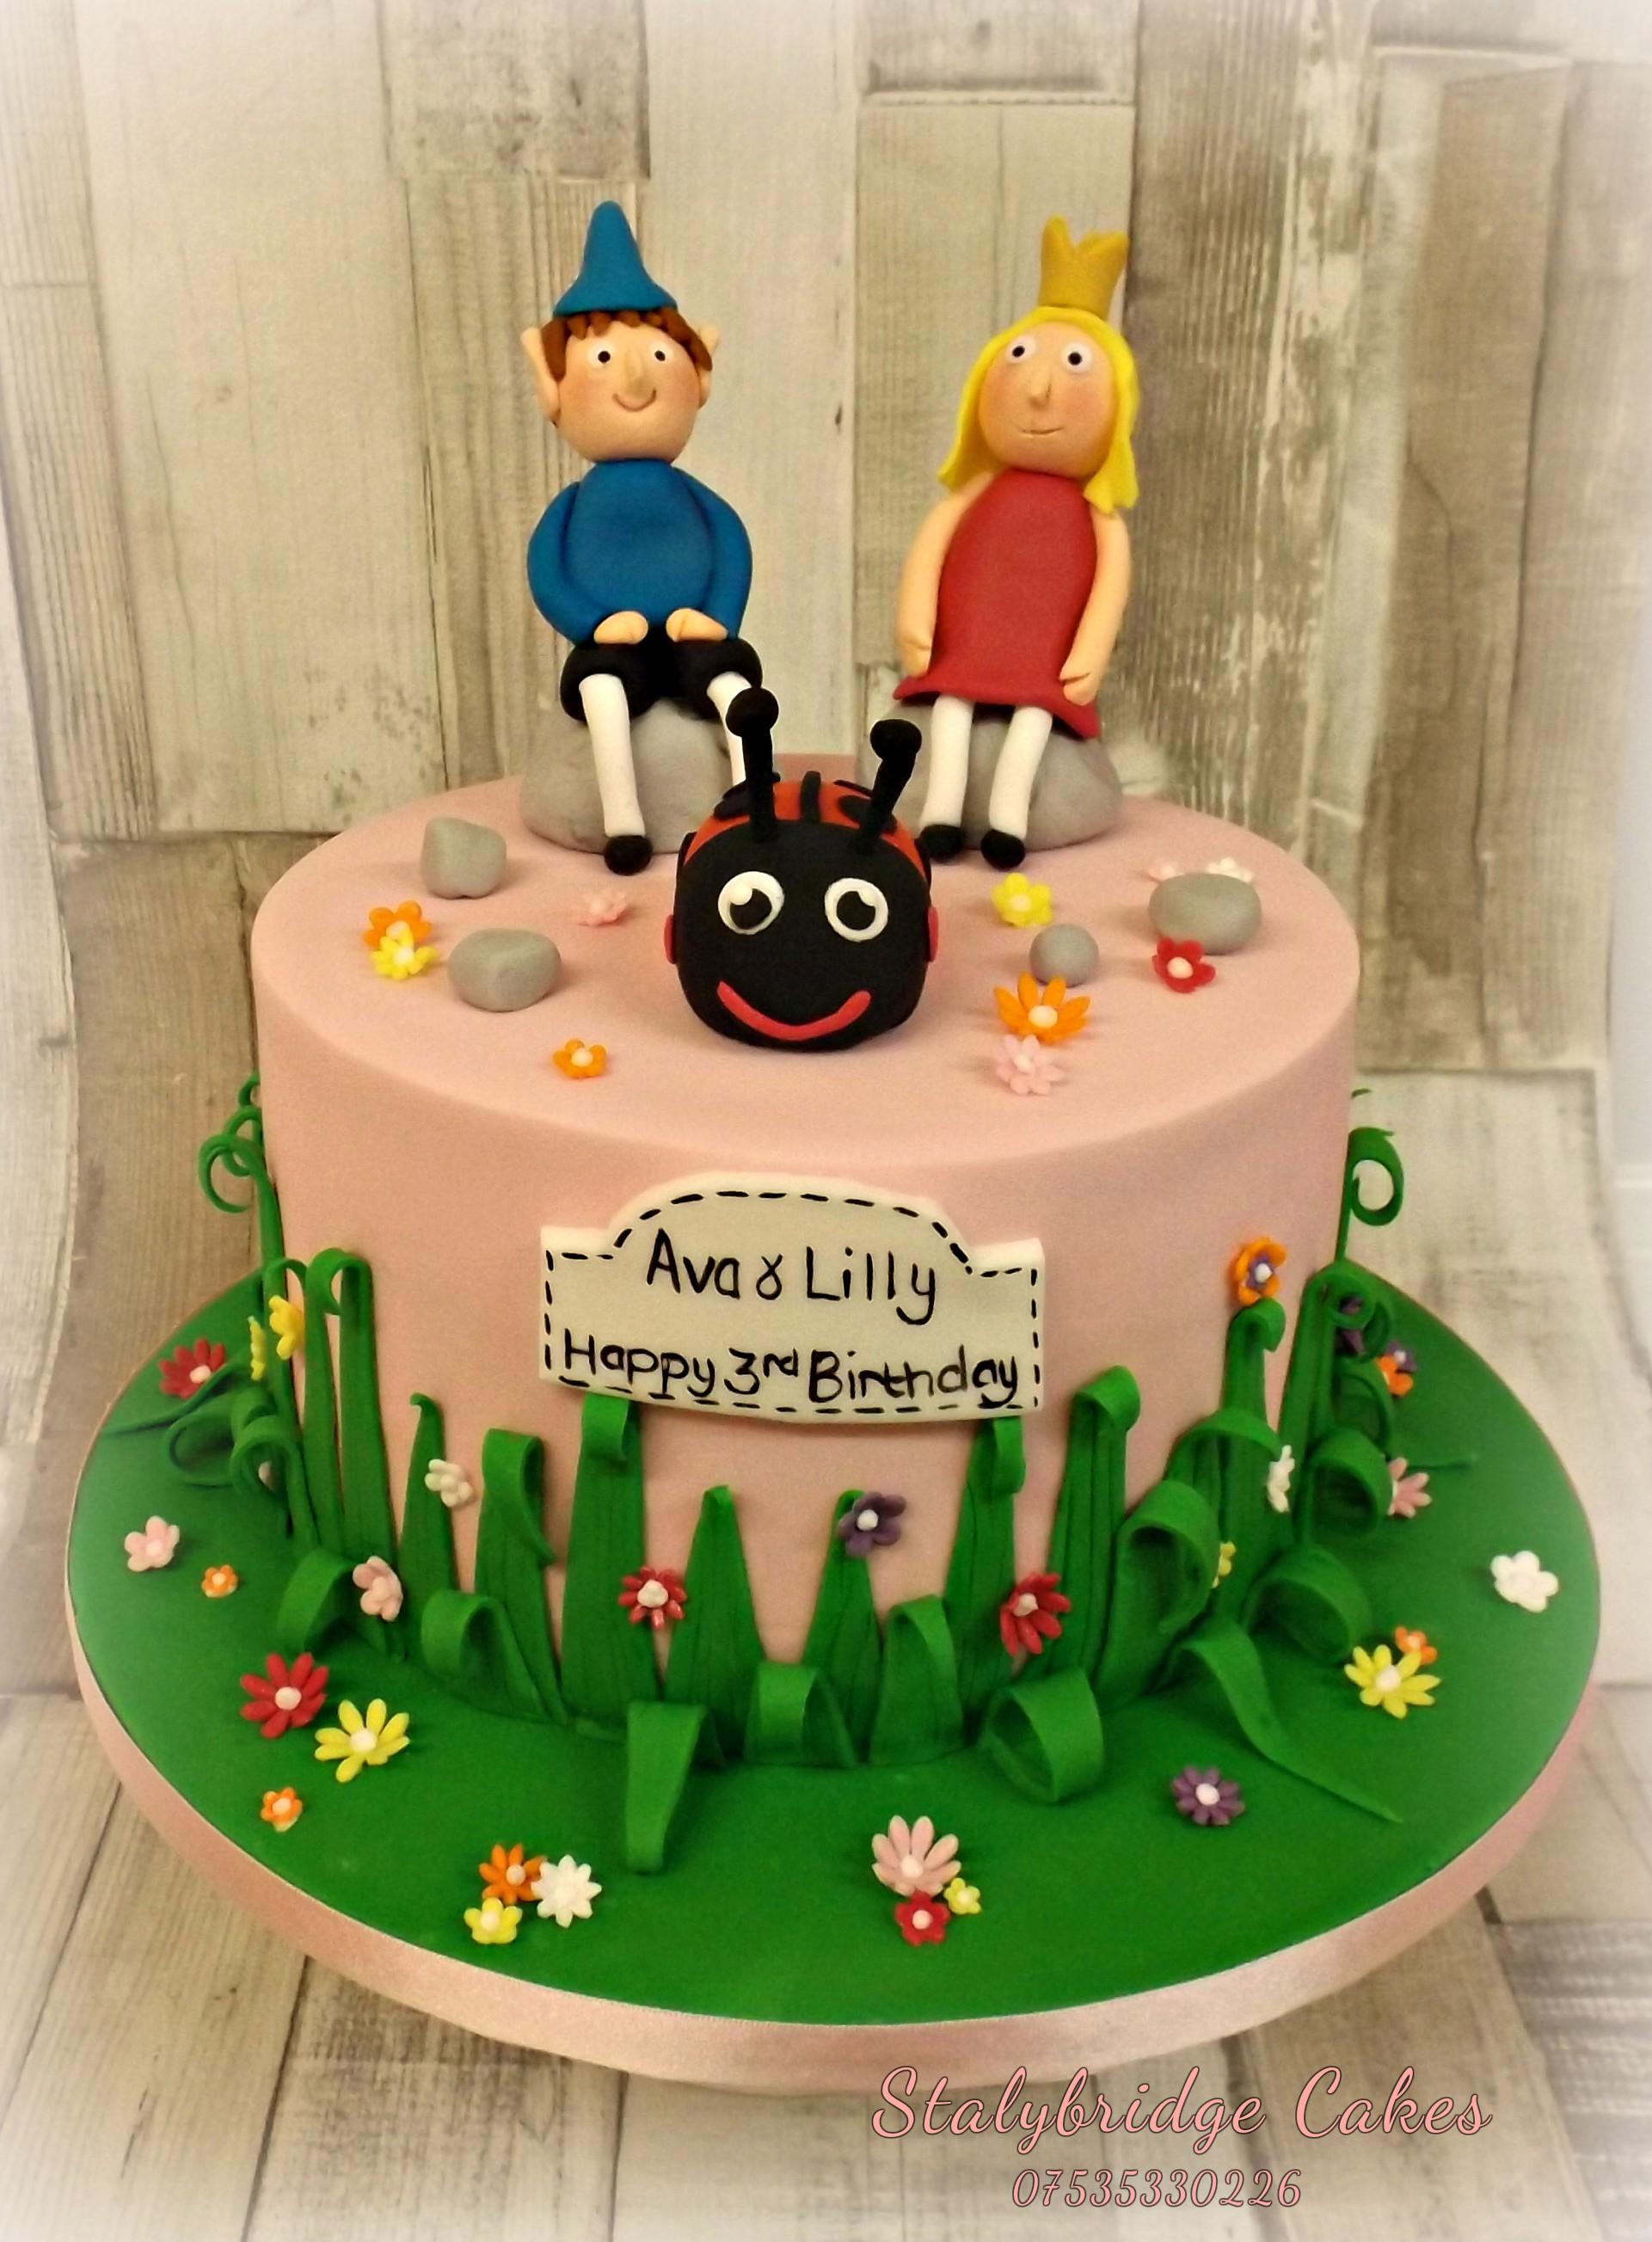 Joint Celebration Cake